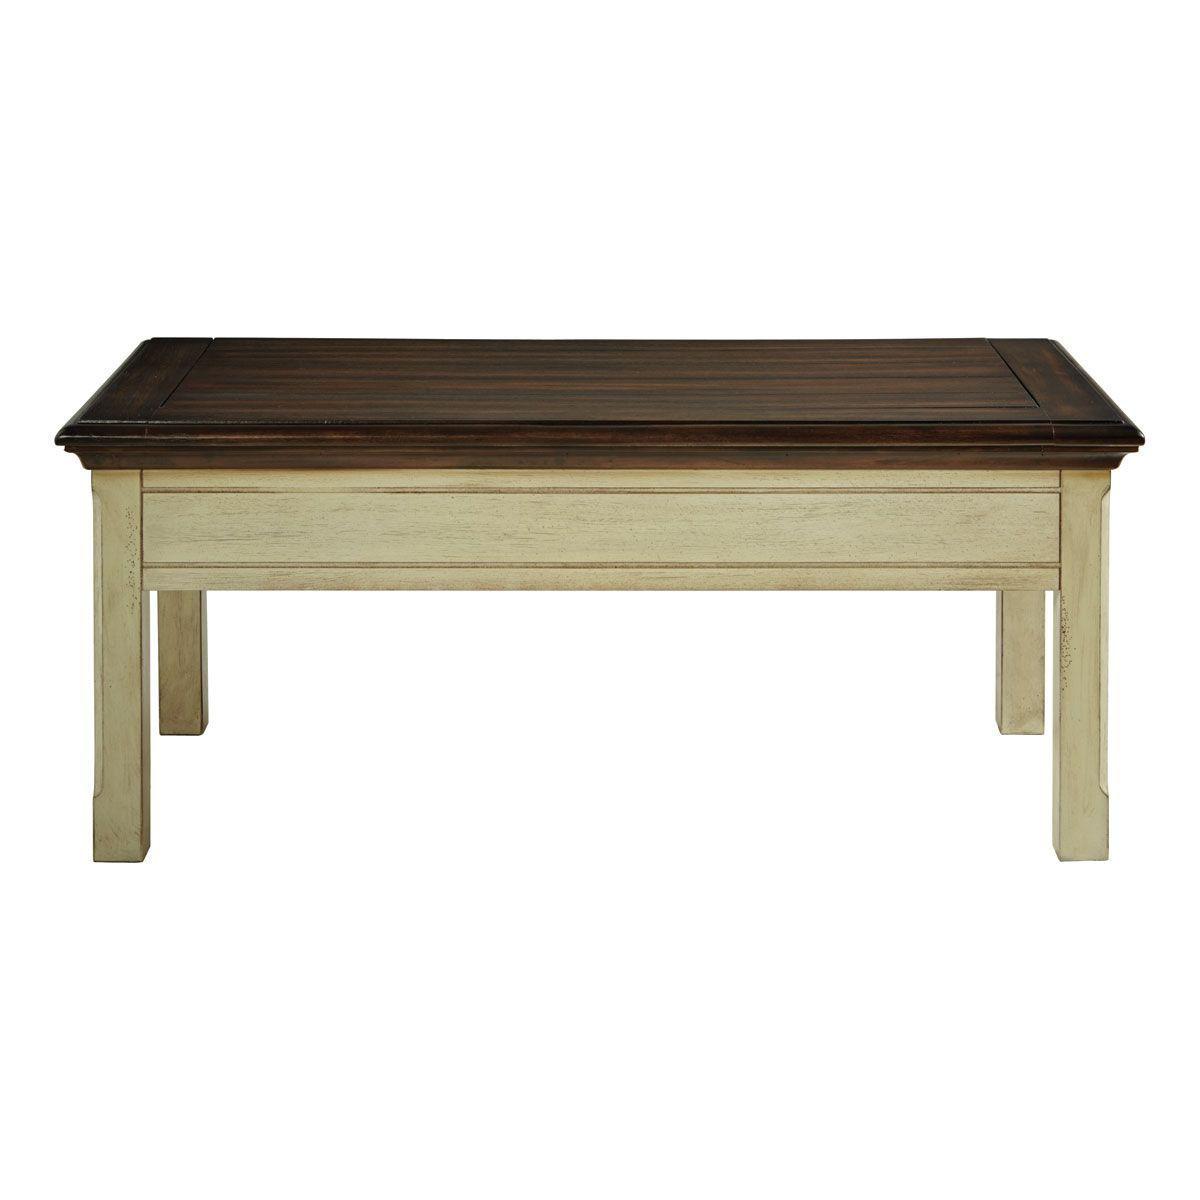 Fairhope Storage Coffee Table Badcock Home Furniture More